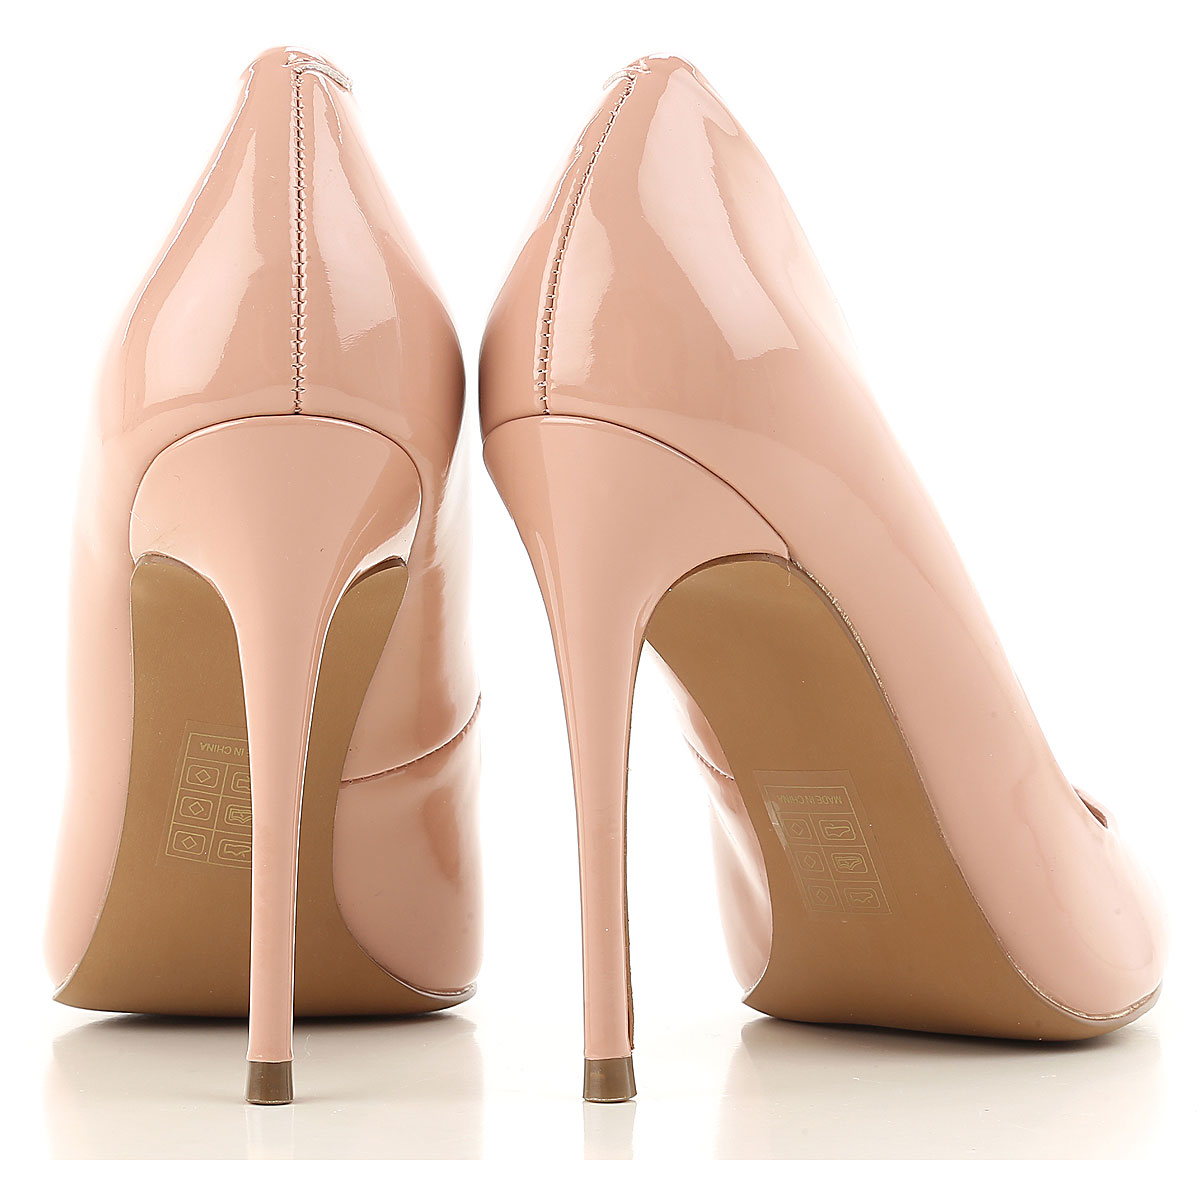 nbsp; Mujer Zapatos Steve invierno Para Otoño 2018 19 Madden Colorete Nude 4vqwPqRxty